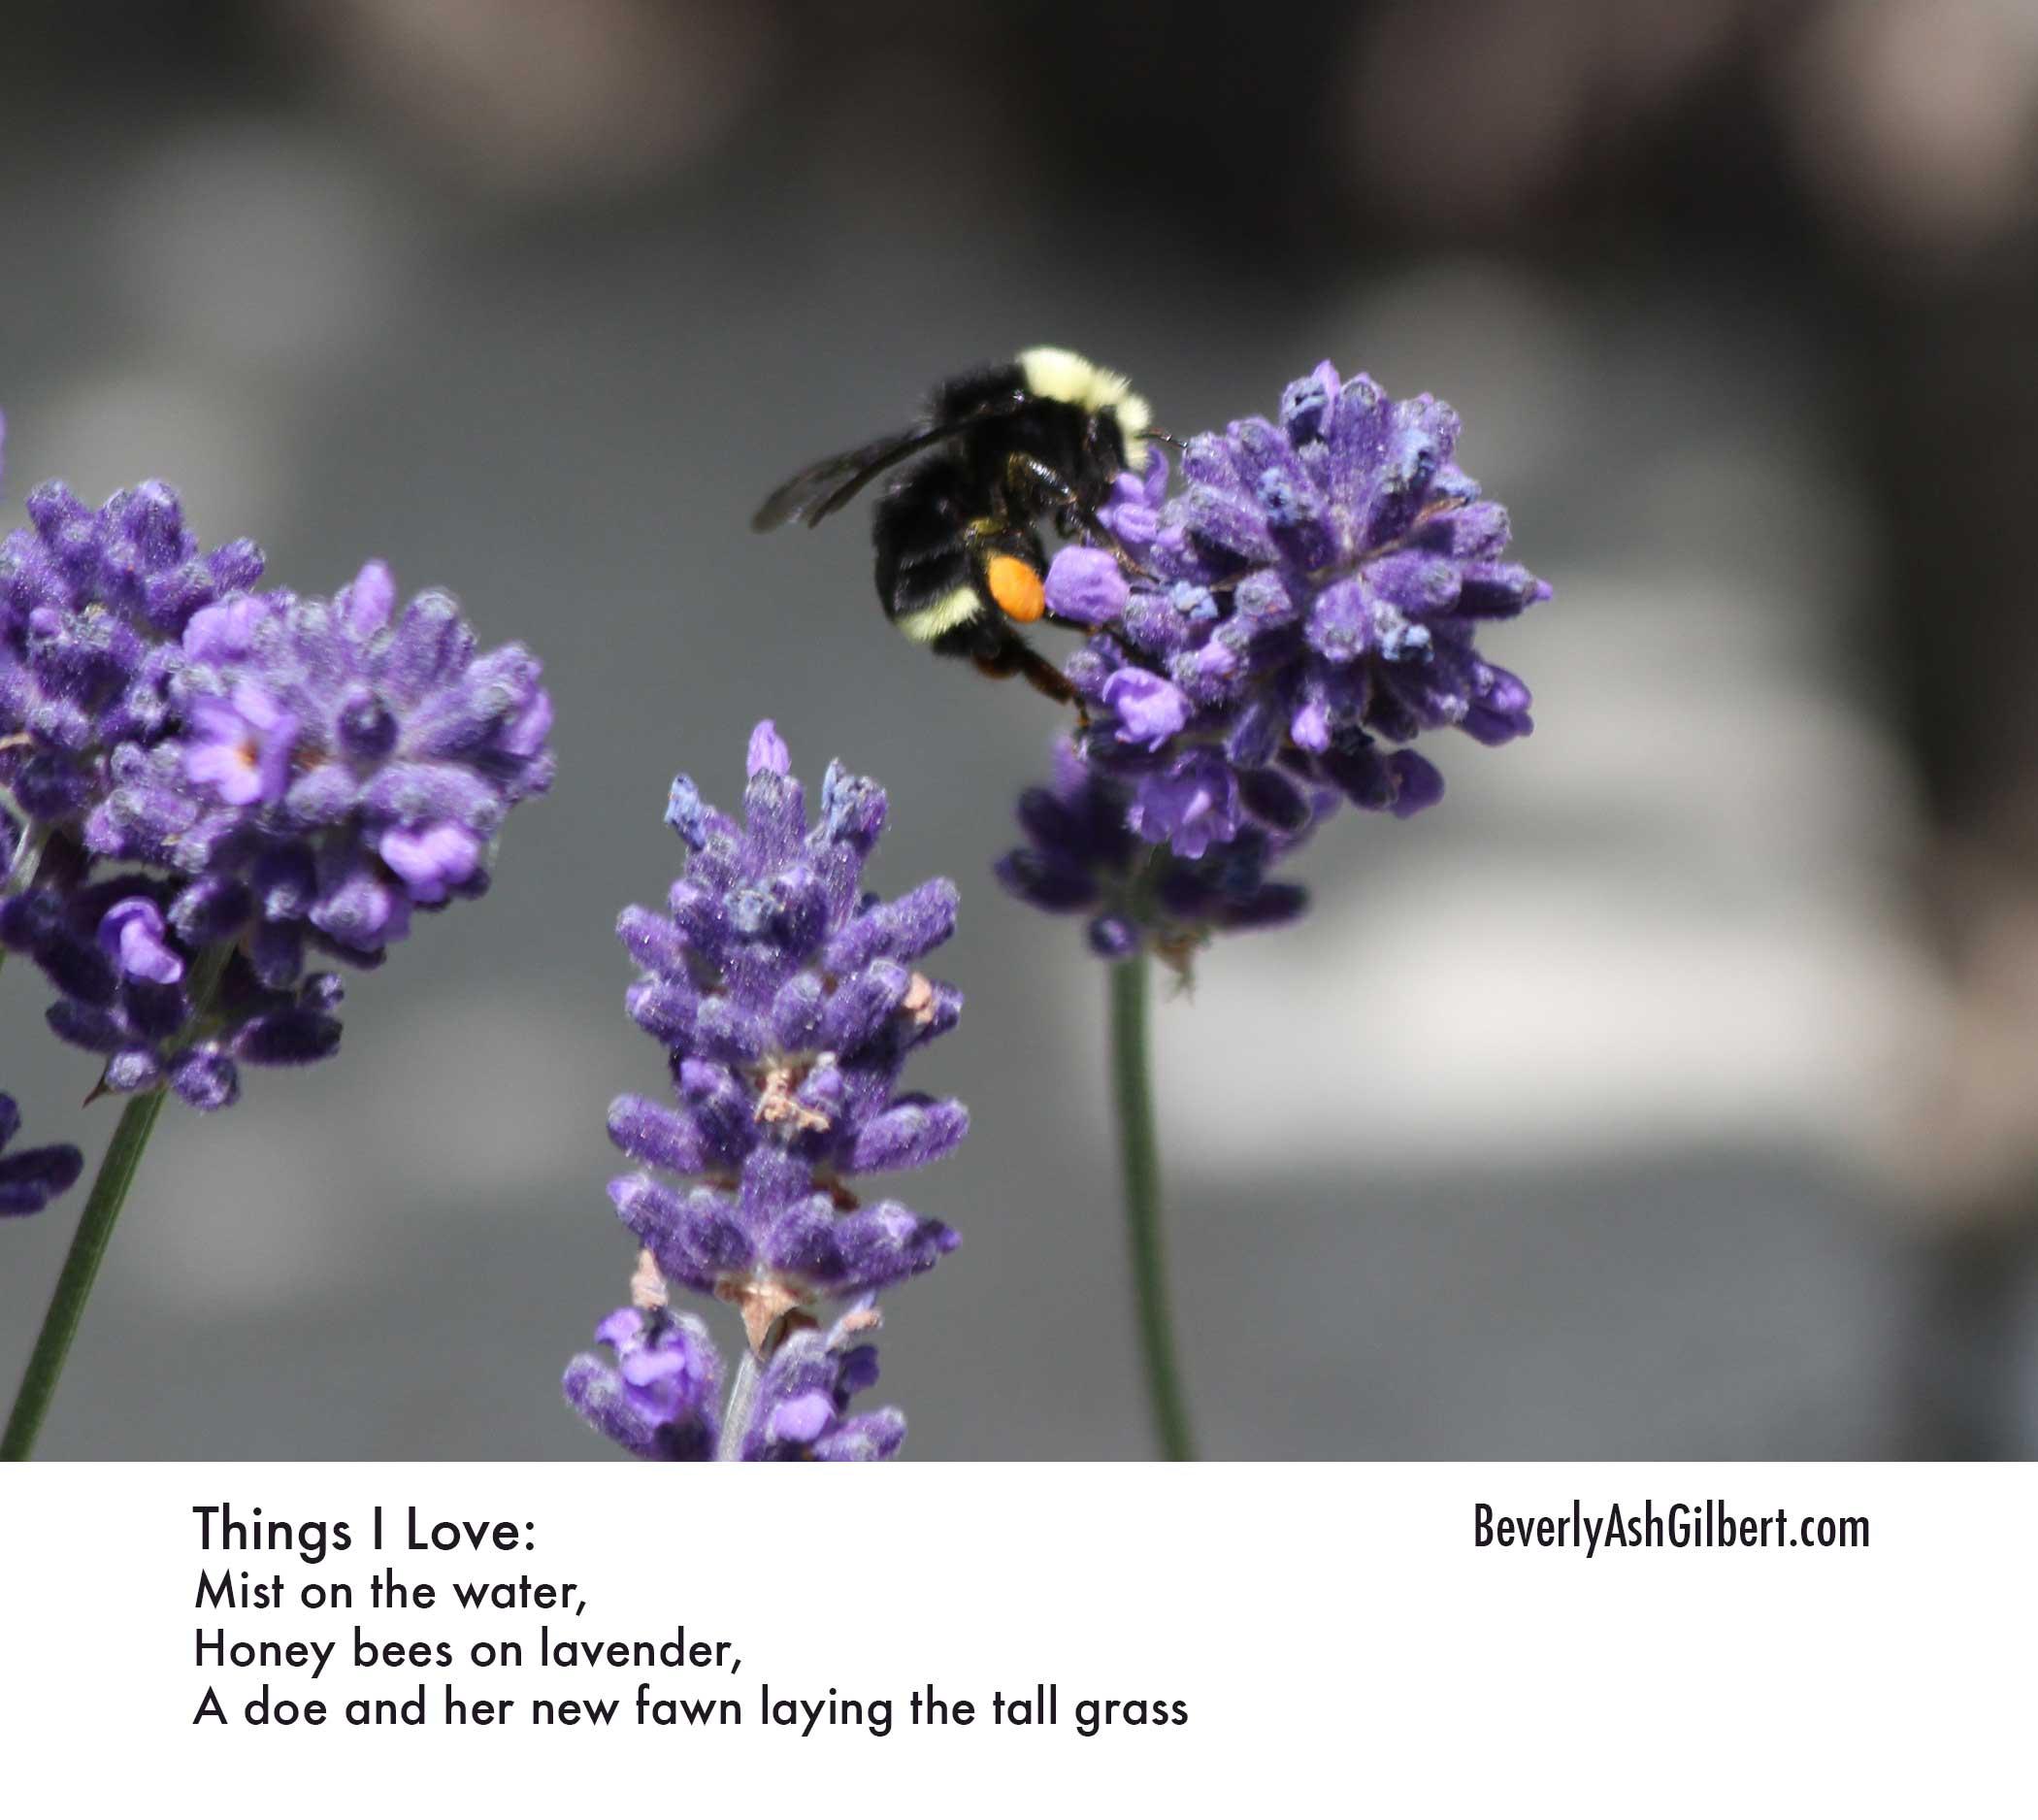 ThingsILove_BeeLavender.jpg